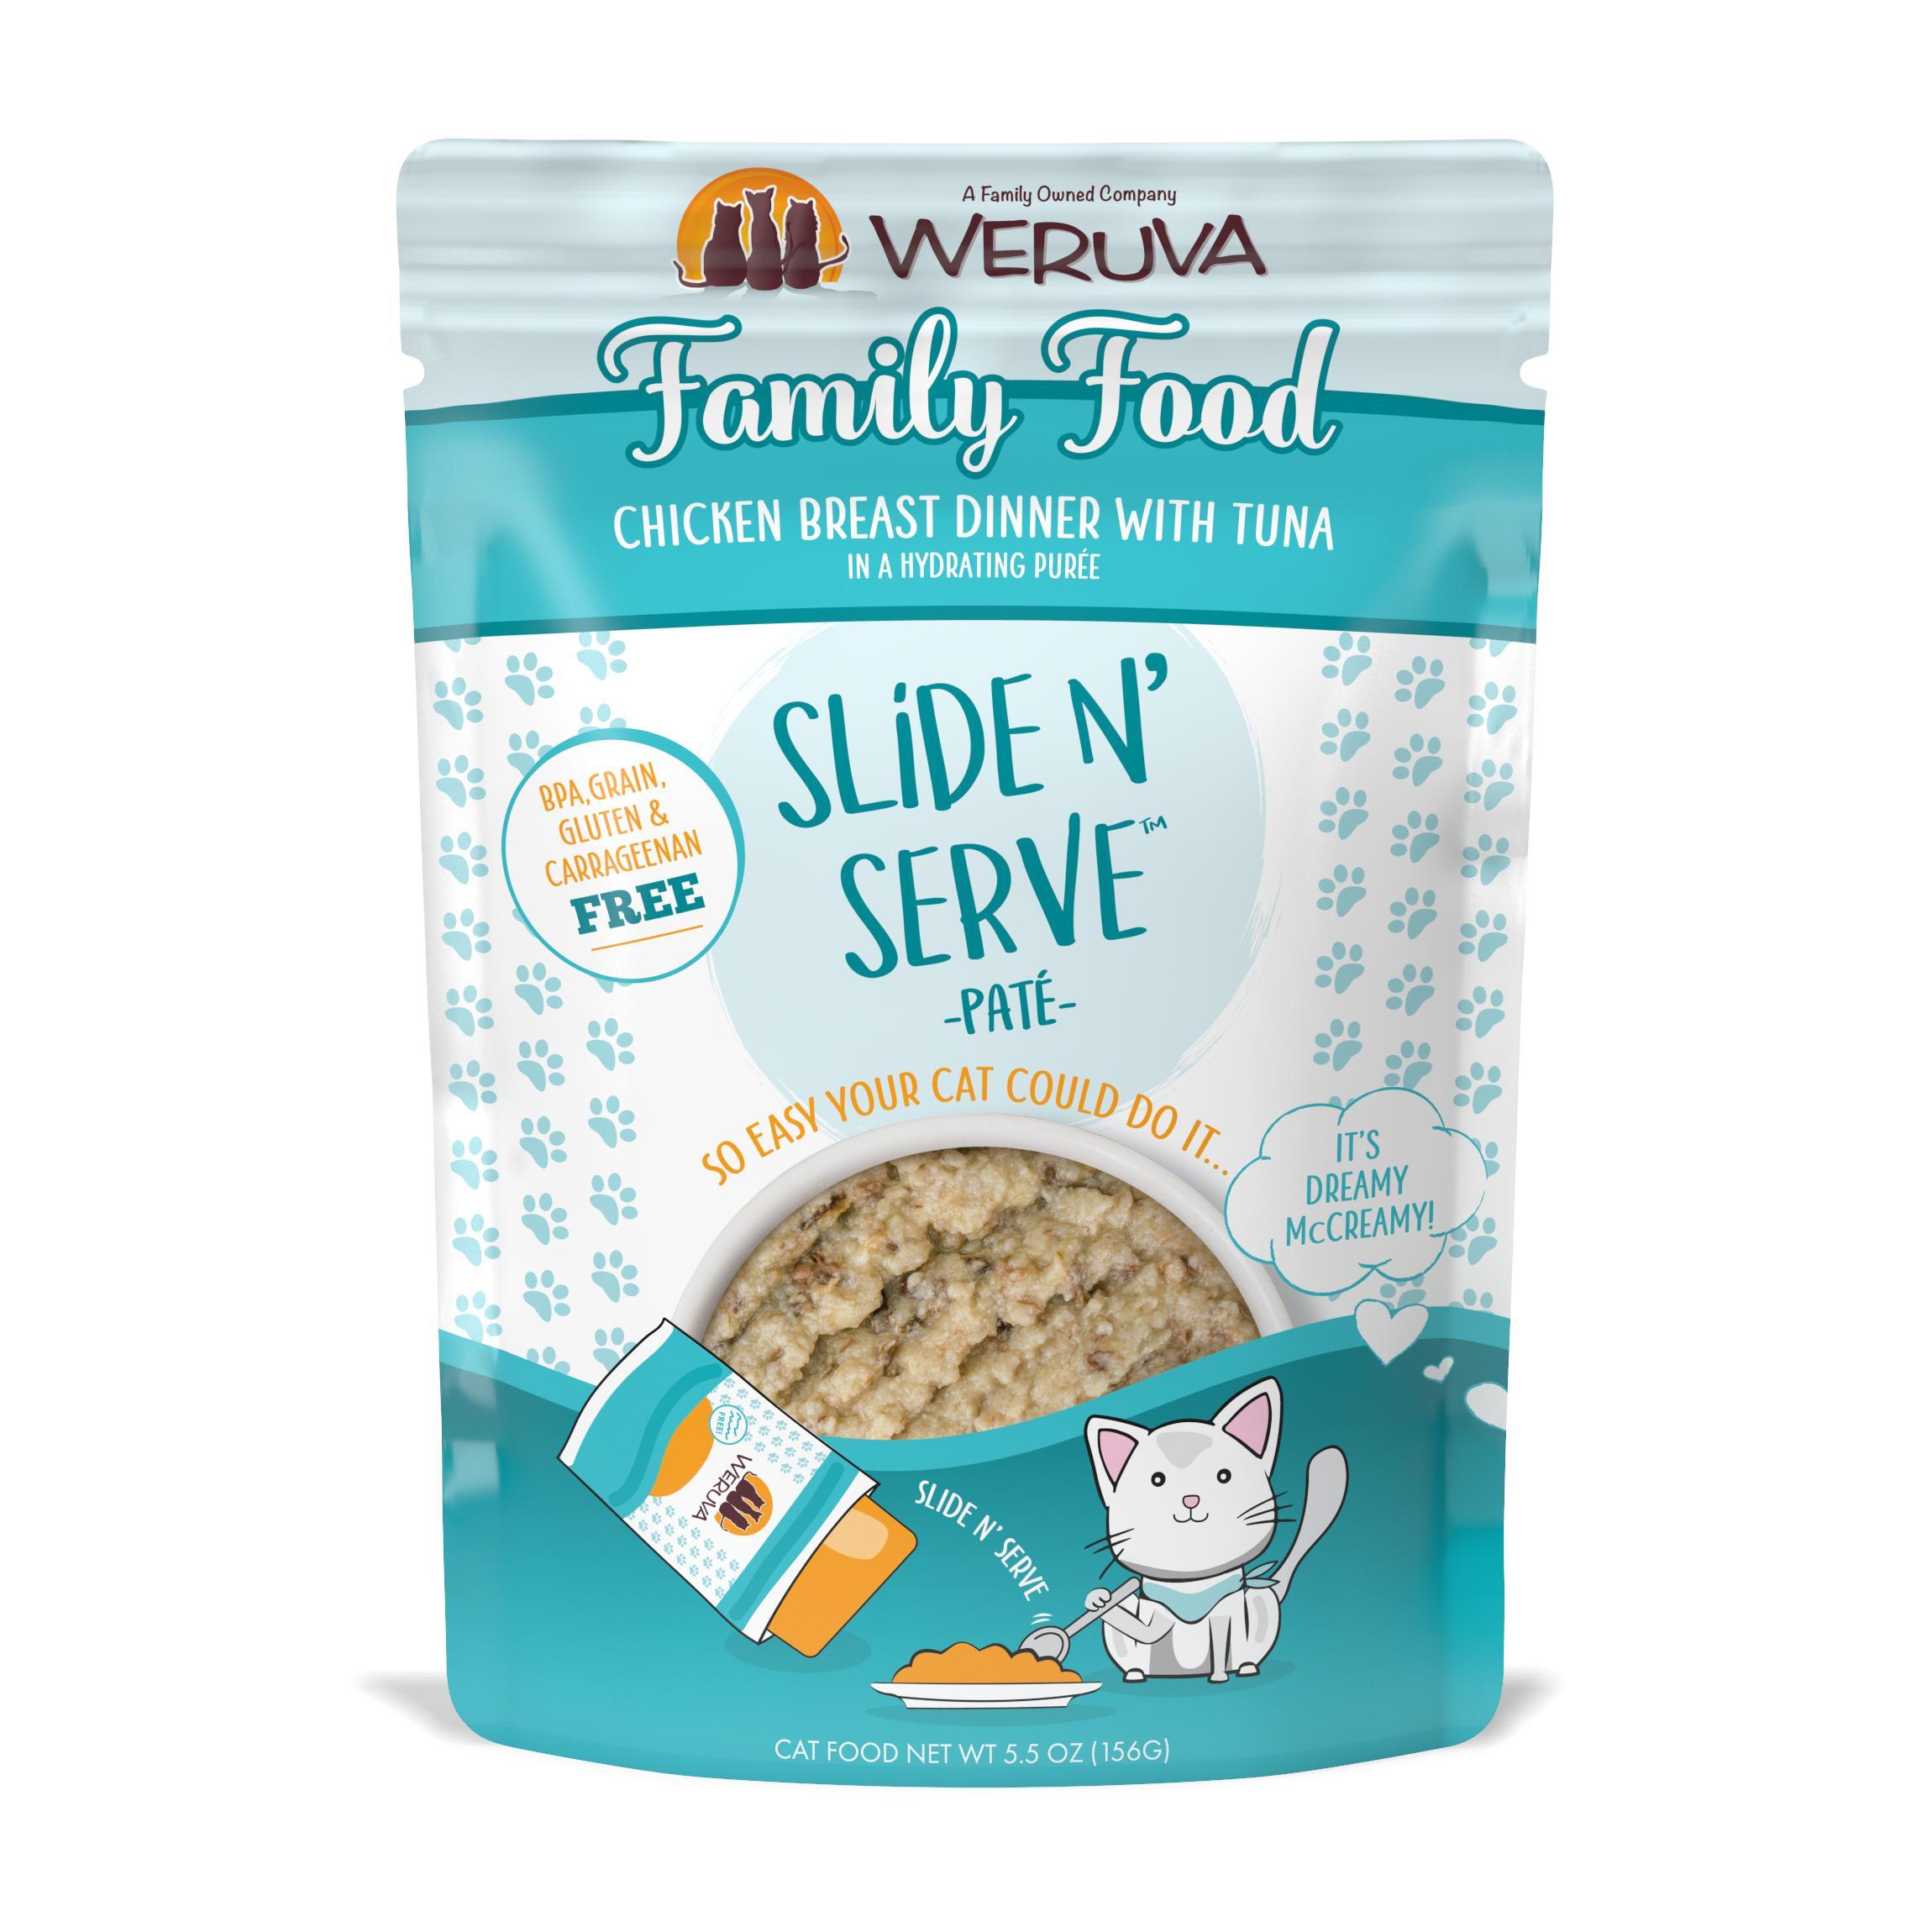 Weruva Cat Slide N' Serve Pate Family Food Chicken Tuna Wet CatFood, 5.5-oz